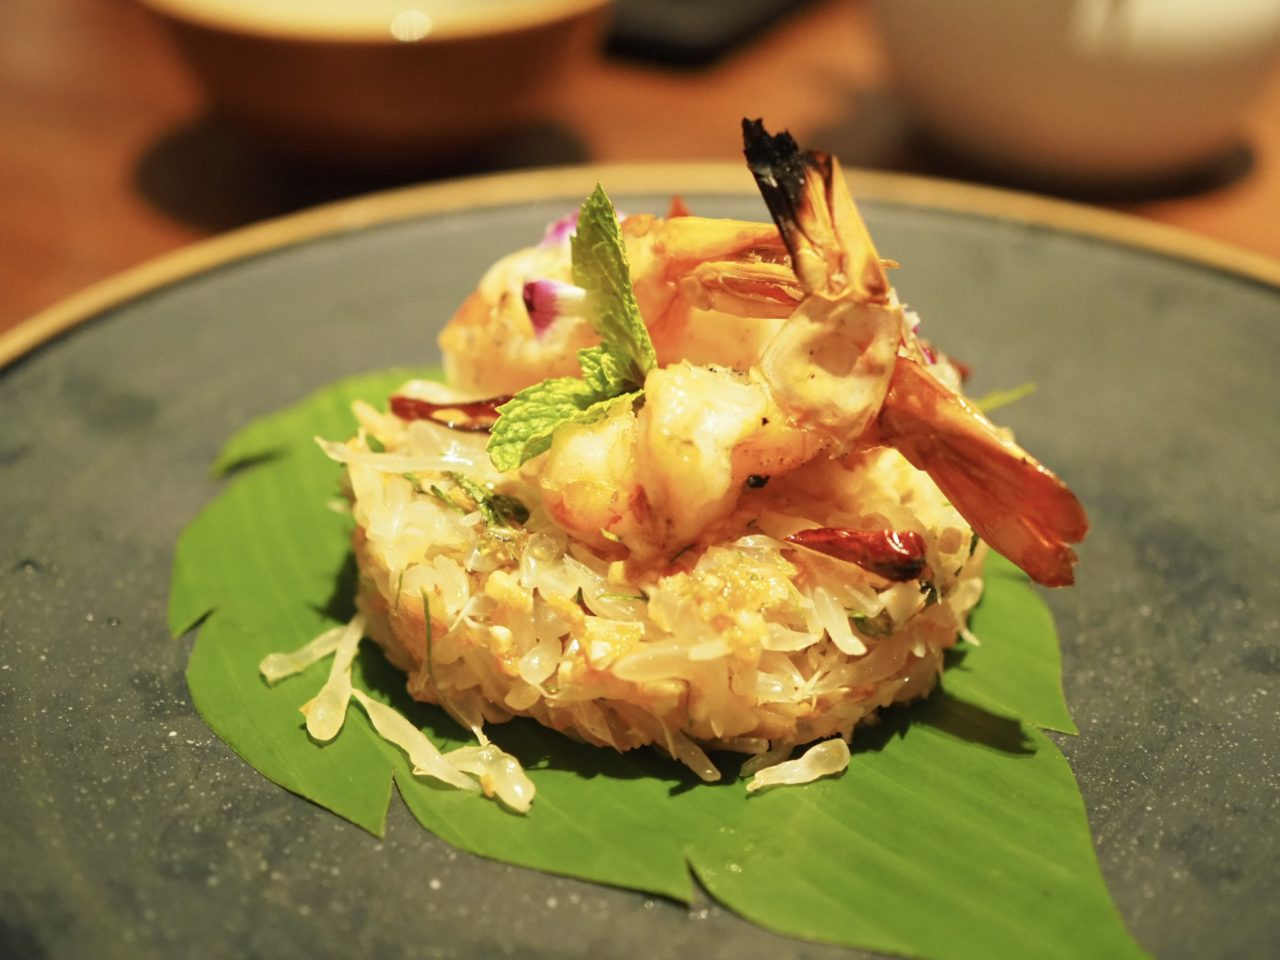 img 2931 - URBAN Cafe - スコータイ上海で味わう本場タイの味!期間限定メニューのご紹介